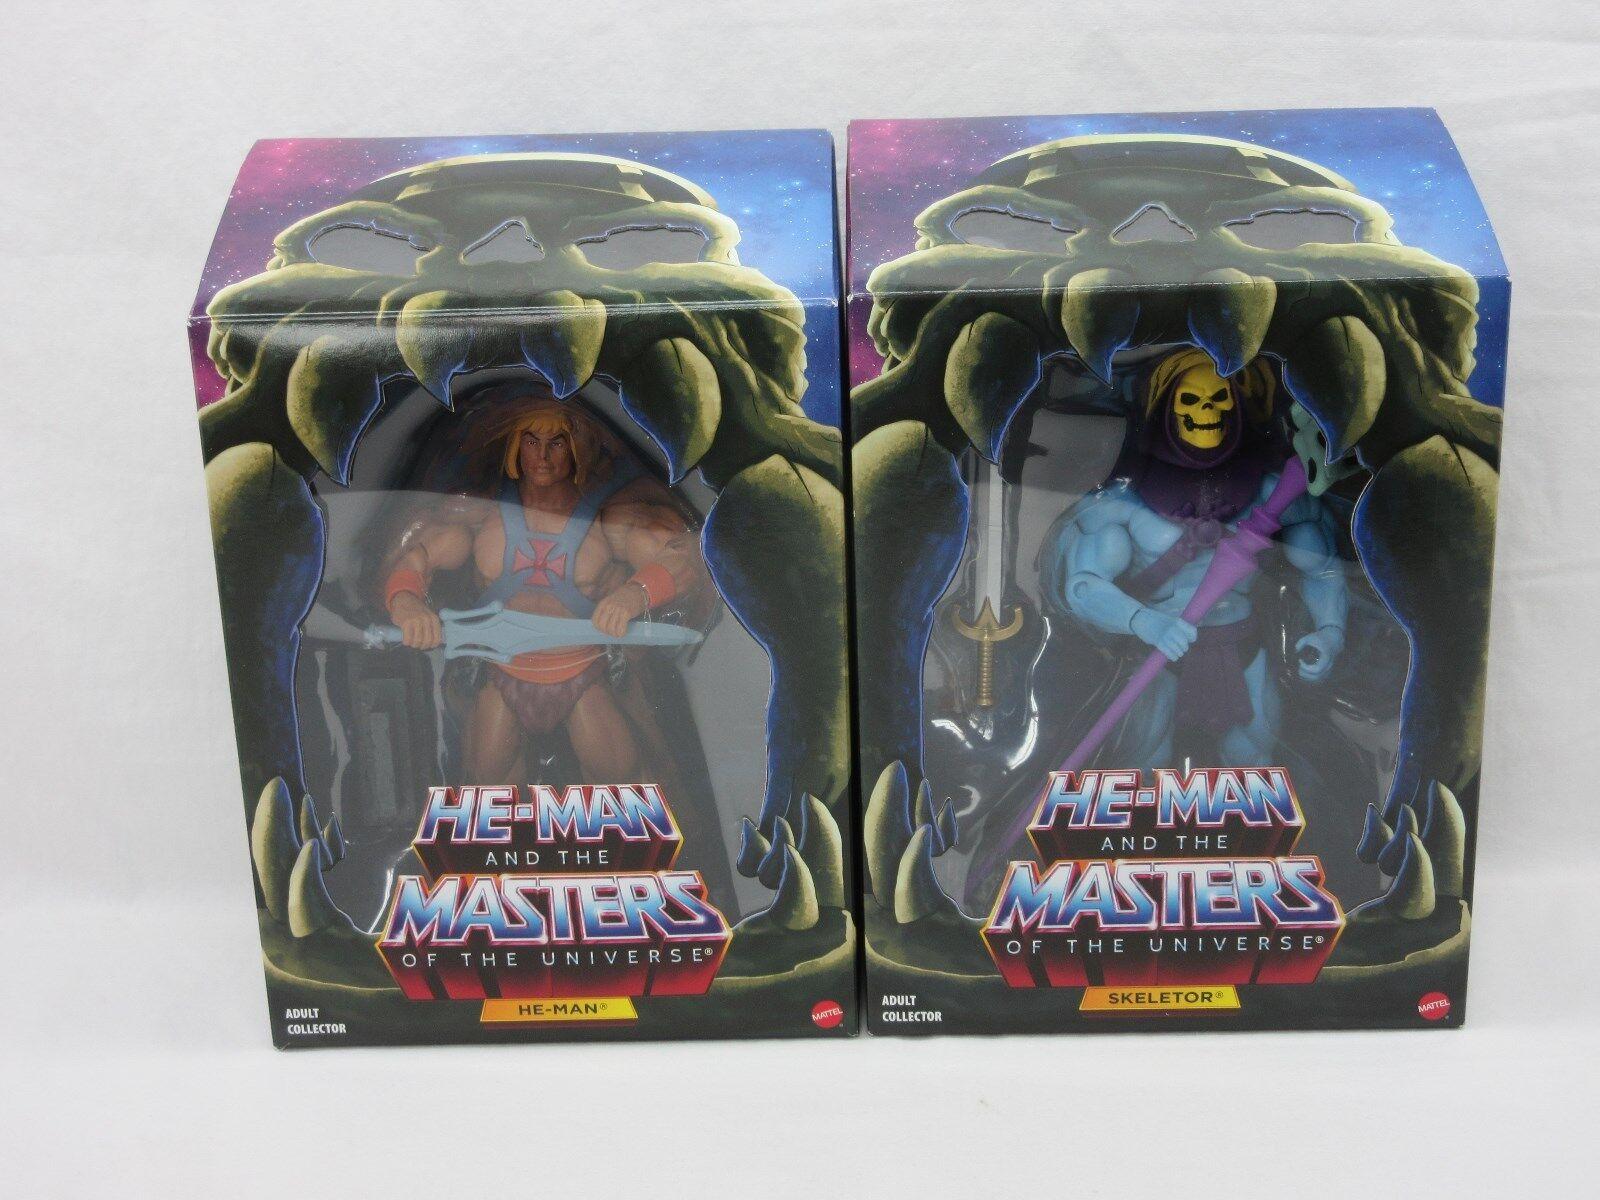 MOTUC,FILMATION & HE-MAN & MOTUC,FILMATION SKELETOR 2.0,Masters Of The Universe Classics,MISB,MOC f68f64